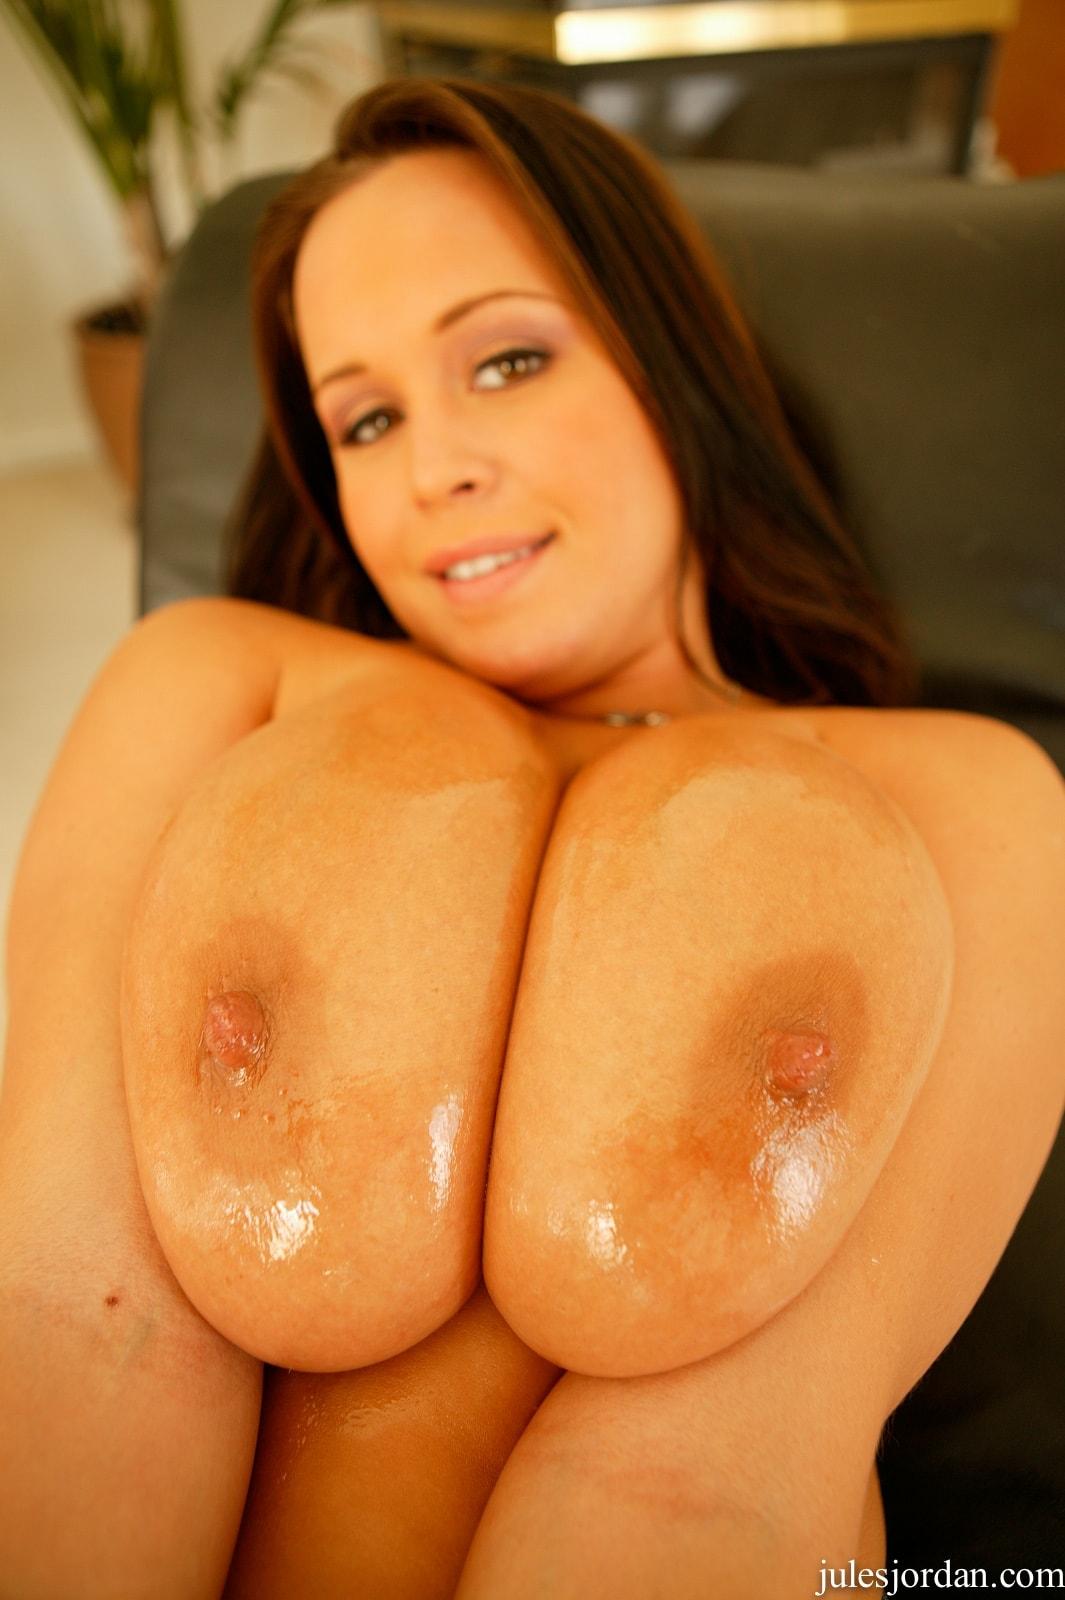 Jules Jordan 'Natural Big Tits' starring Brandy Taylor (Photo 5)